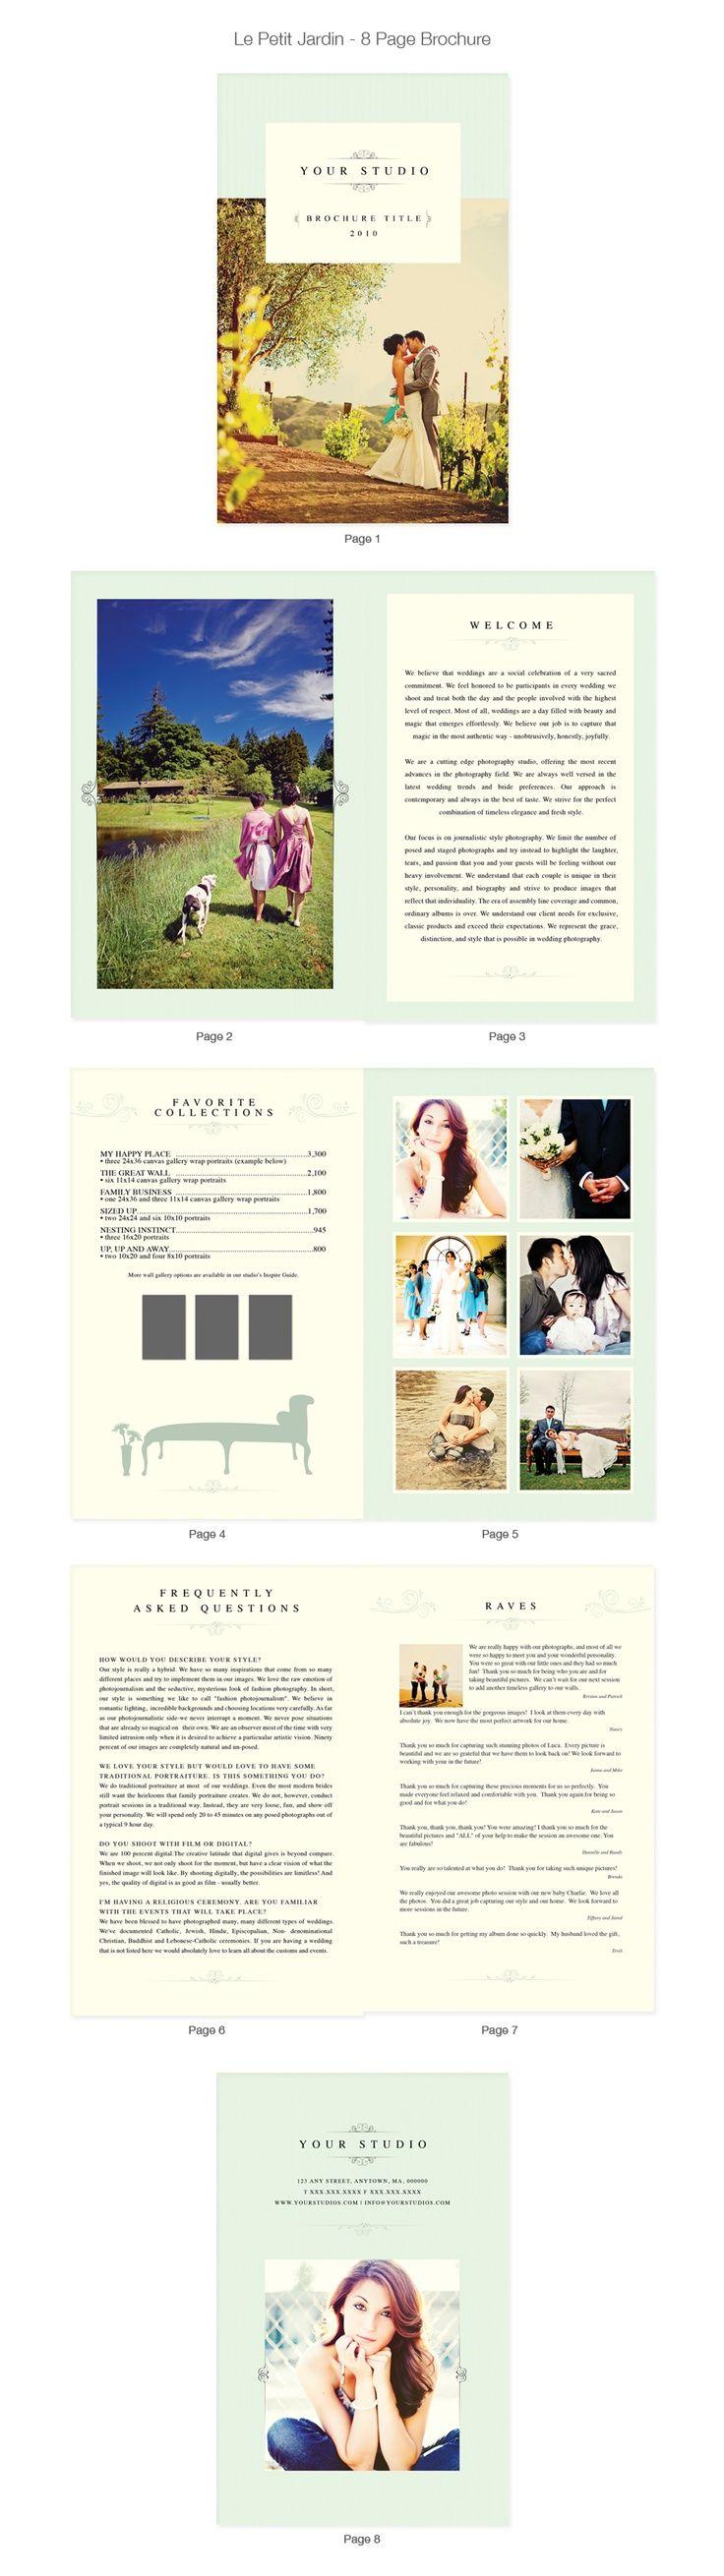 Best Wedding Brochure Images On   Wedding Brochure